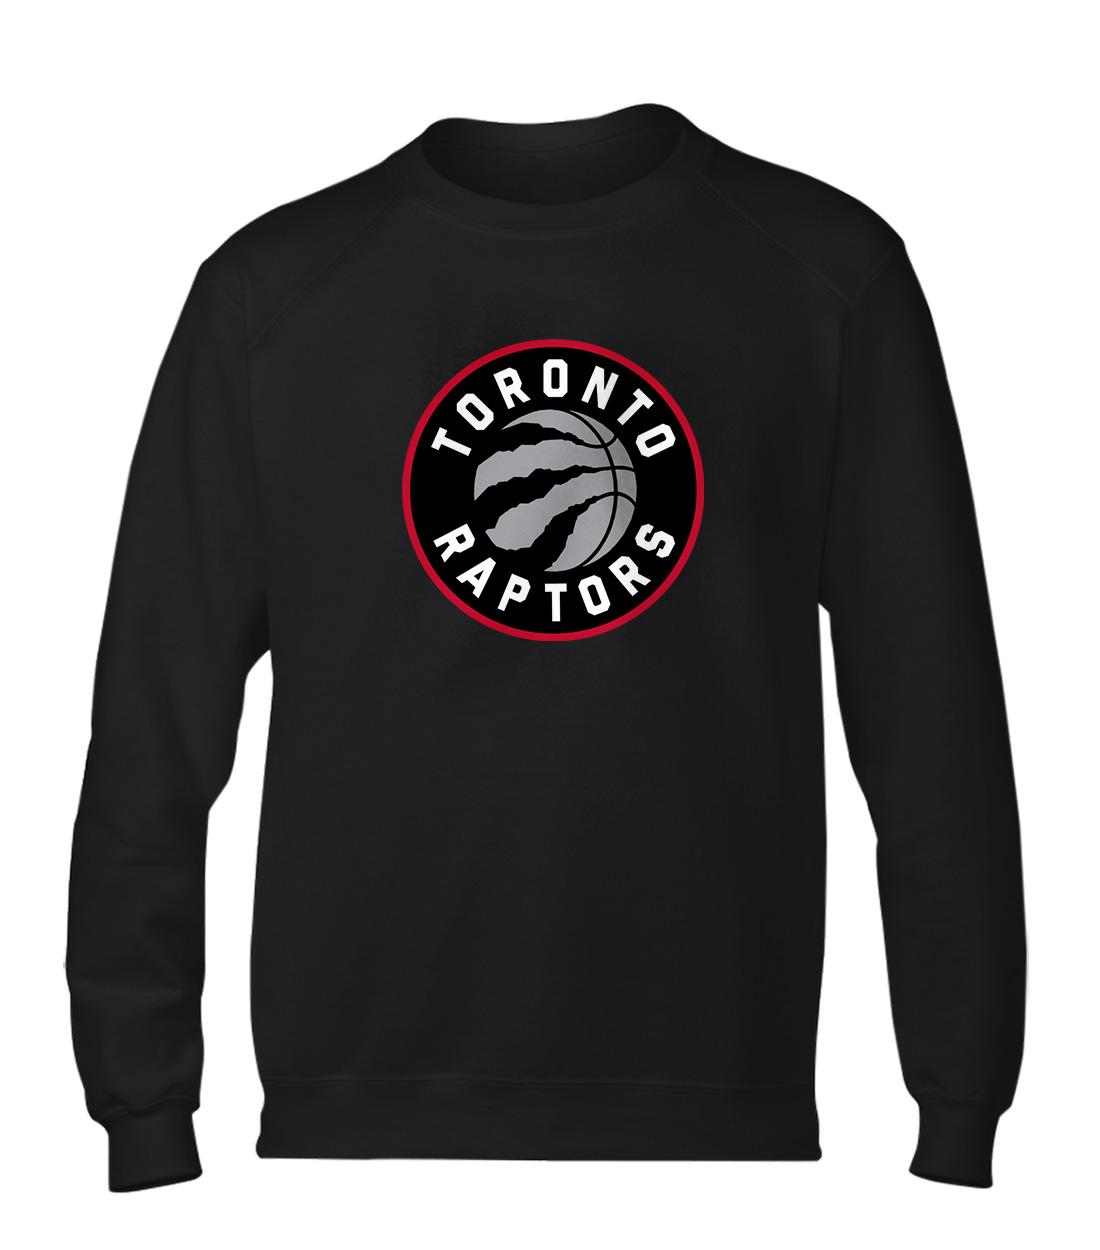 Toronto Raptors Basic (BSC-BLC-NP-197-NBA-TOR-LOGO)